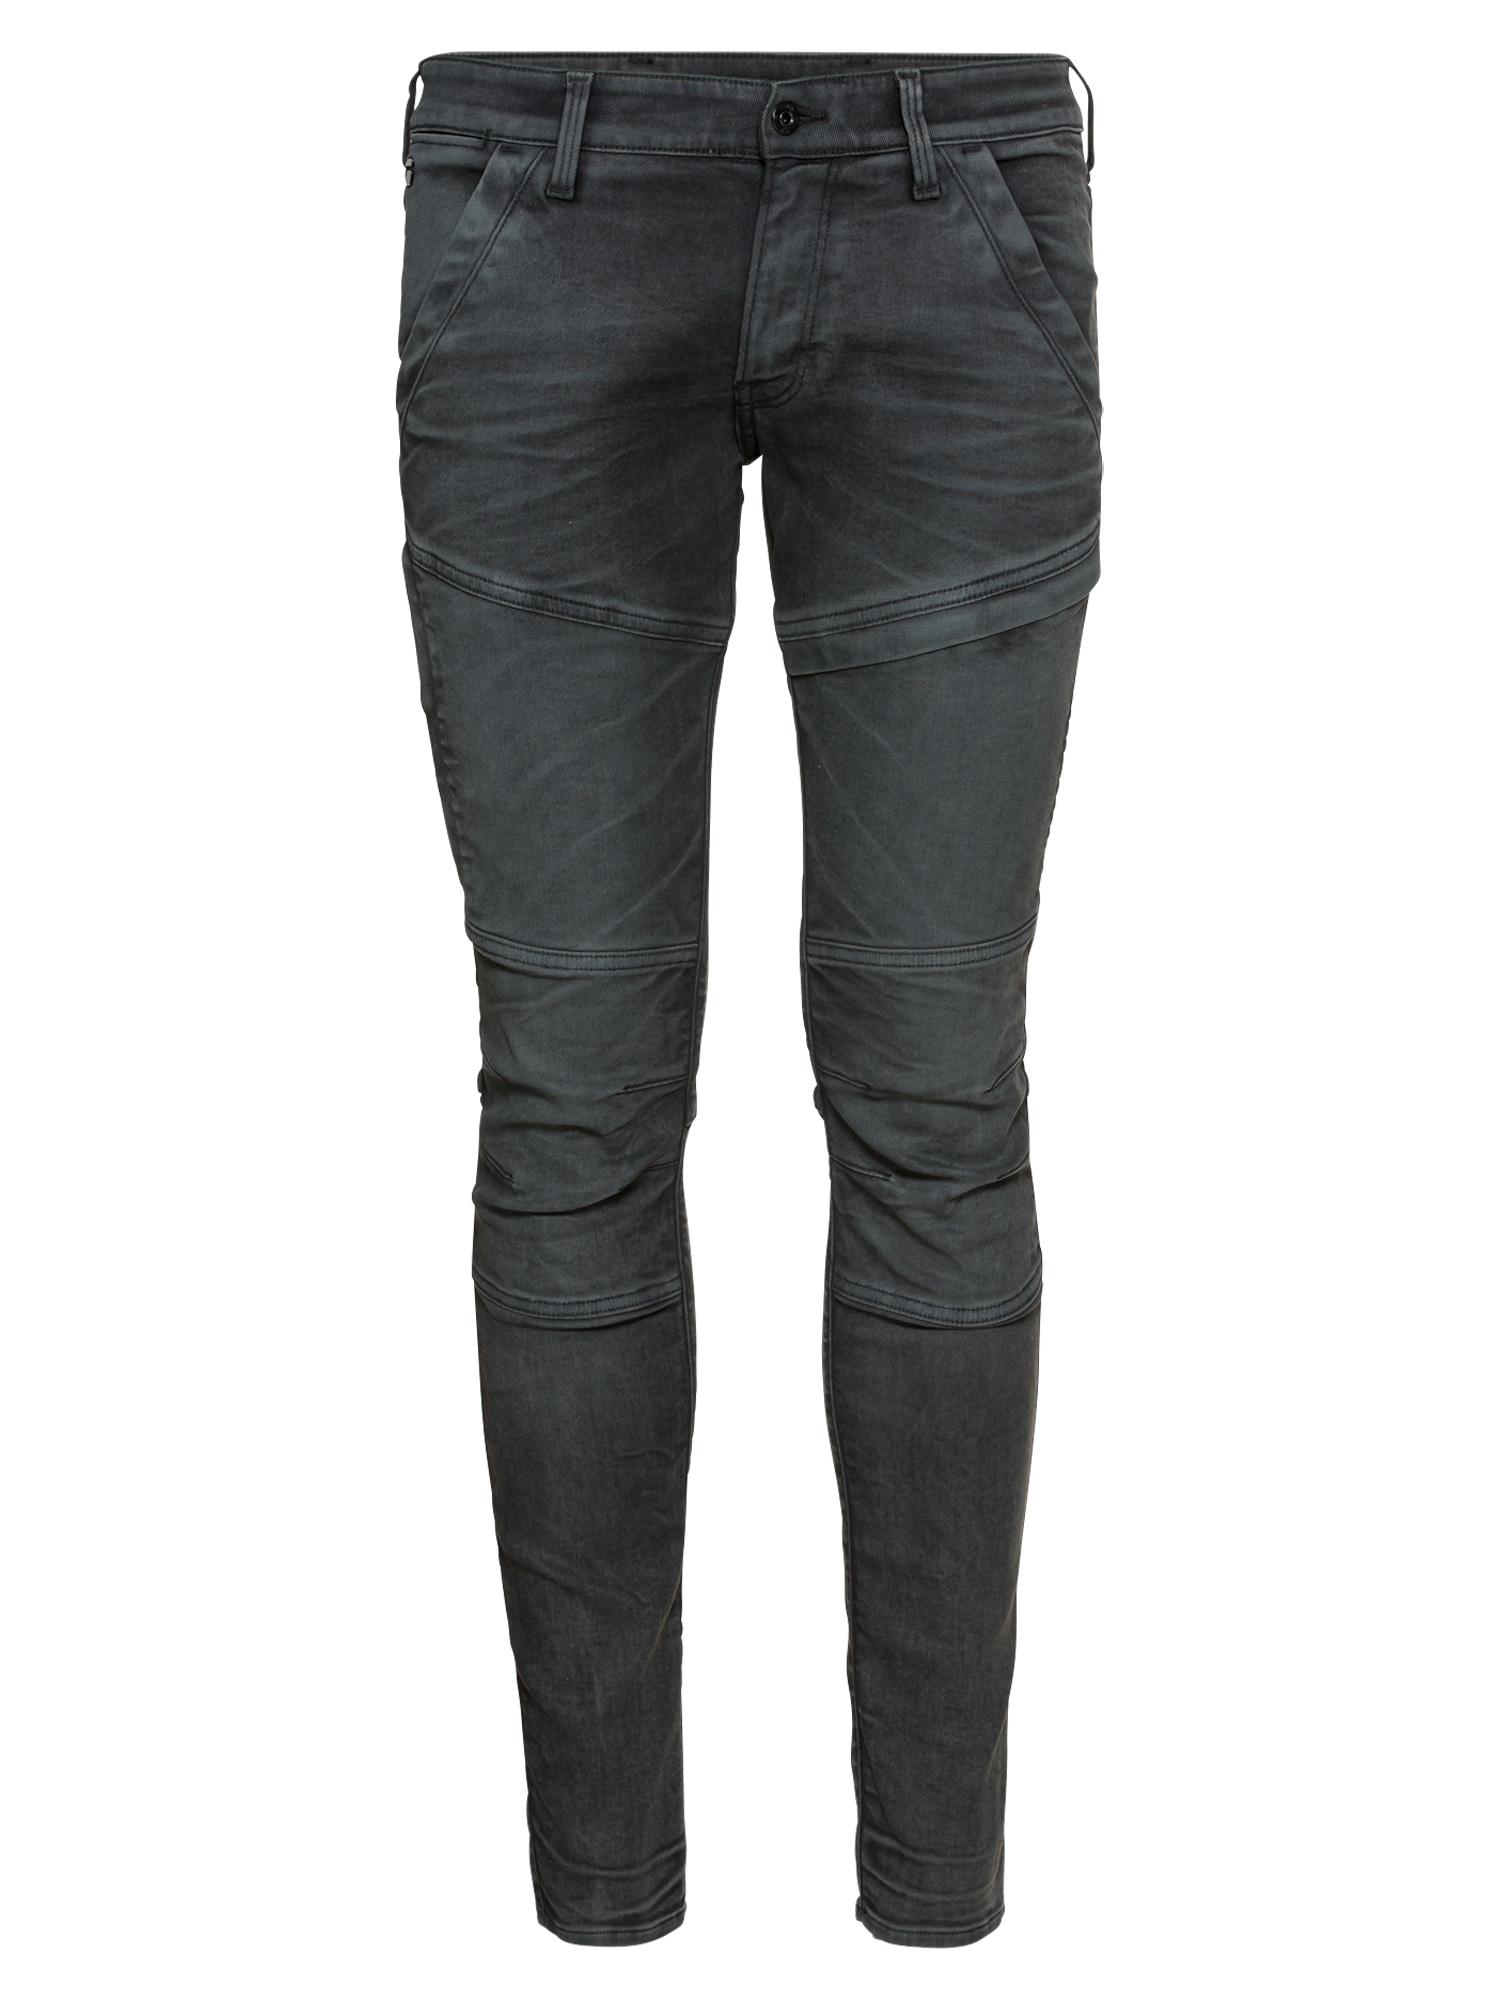 G-STAR RAW Heren Jeans Rackam Skinny COJ grey denim